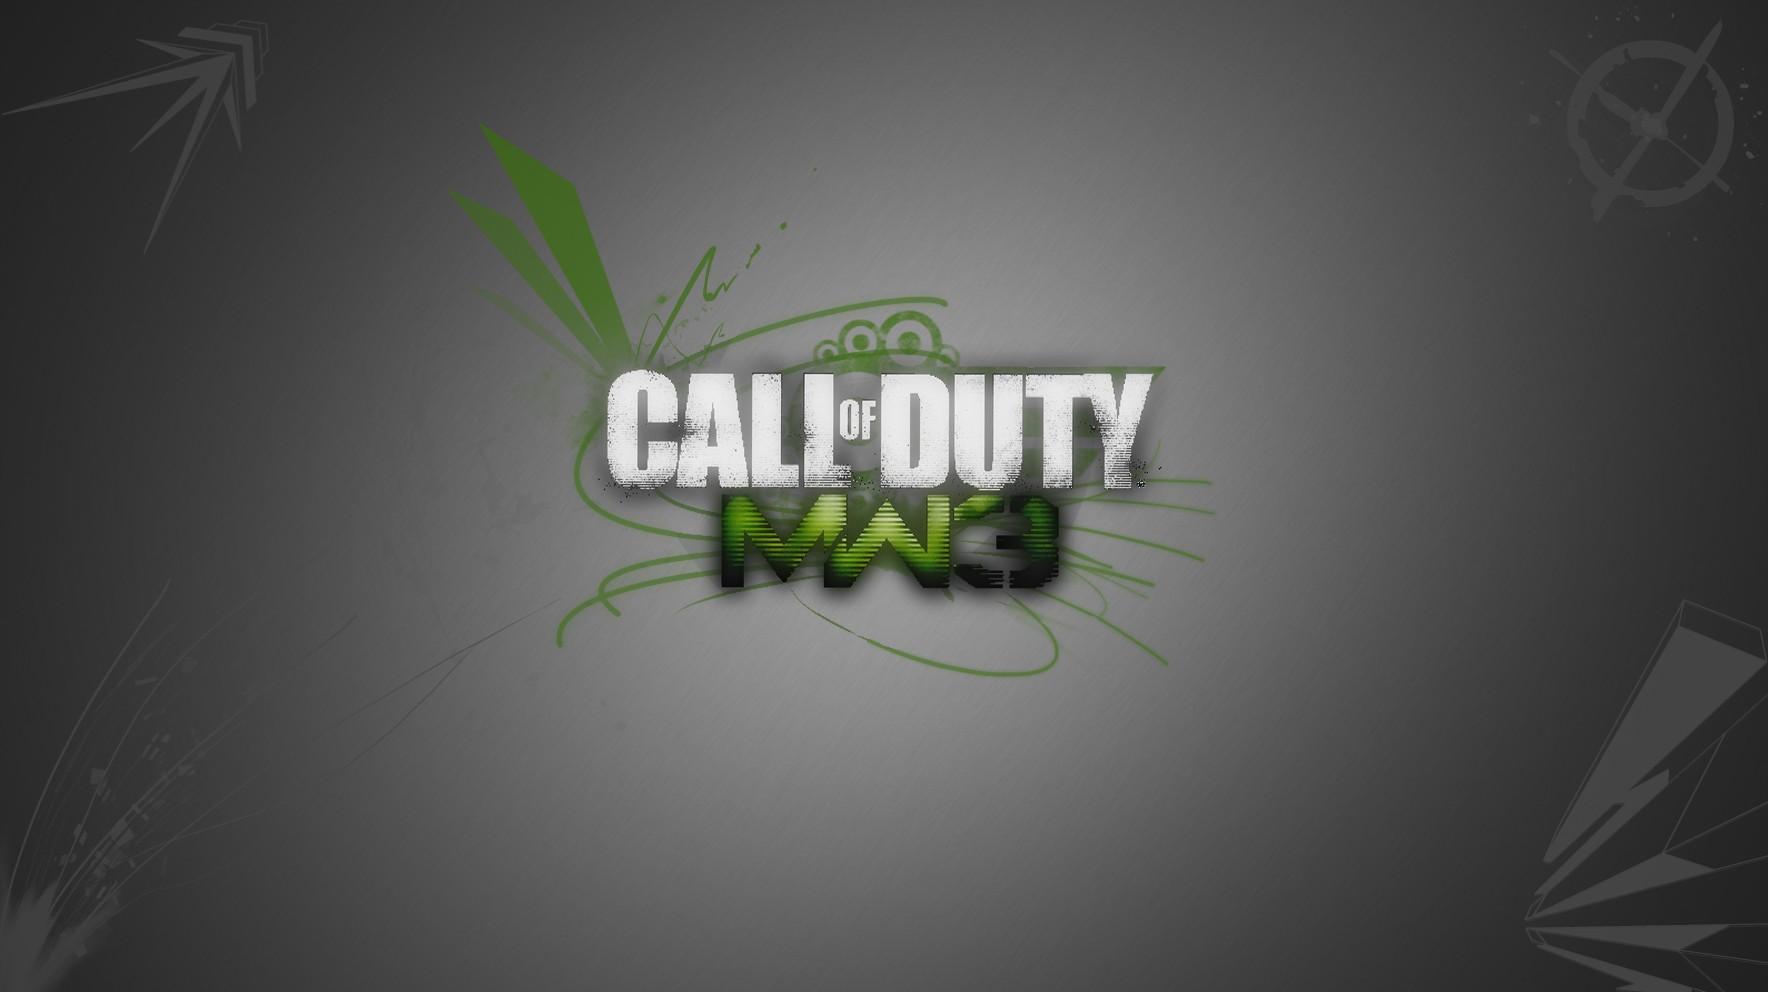 Call of Duty Modern Warfare 3 wallpaper 17